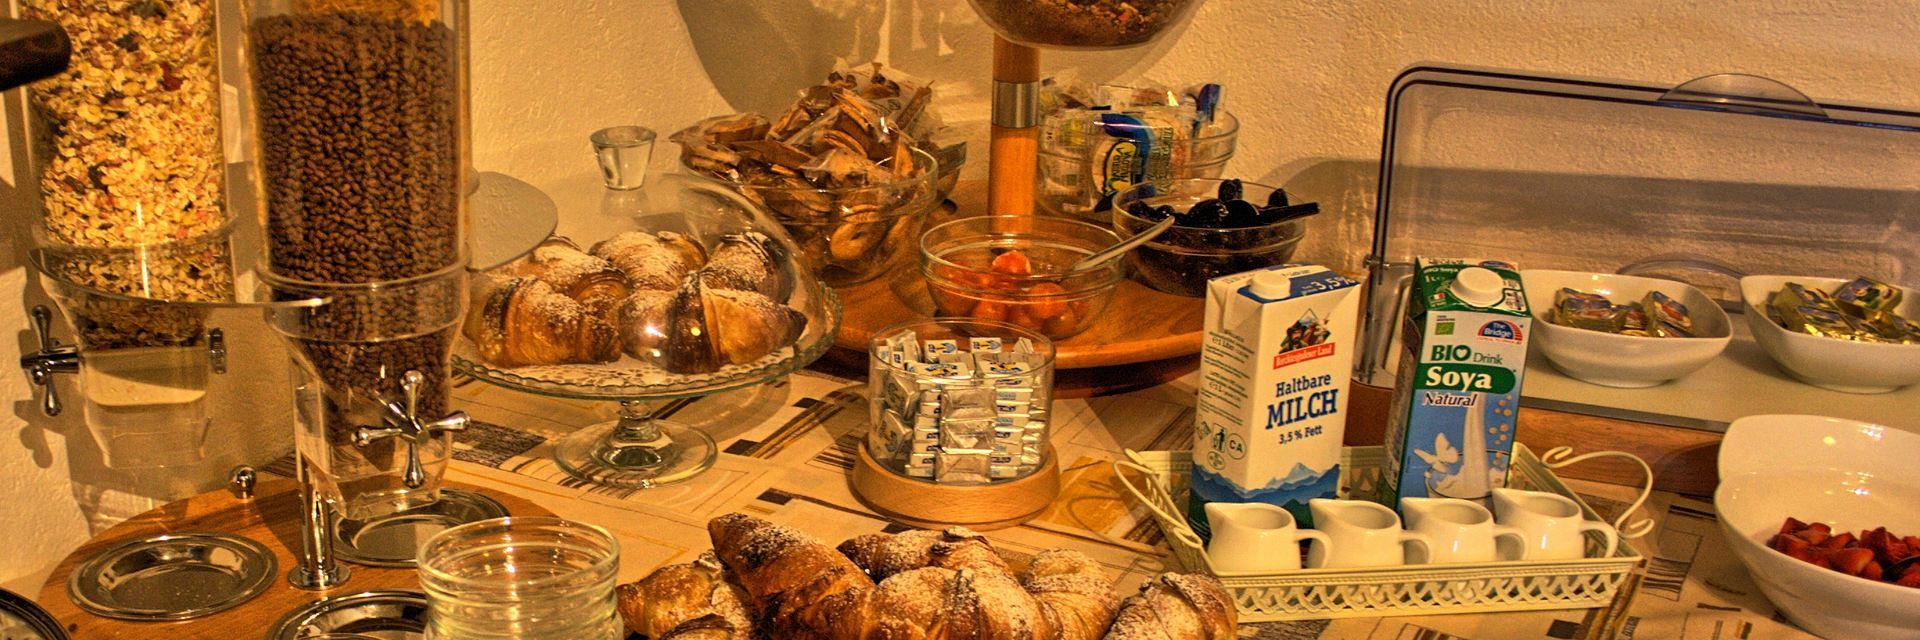 hotel-ristorante-menapace-torri-del-benaco-05.jpg